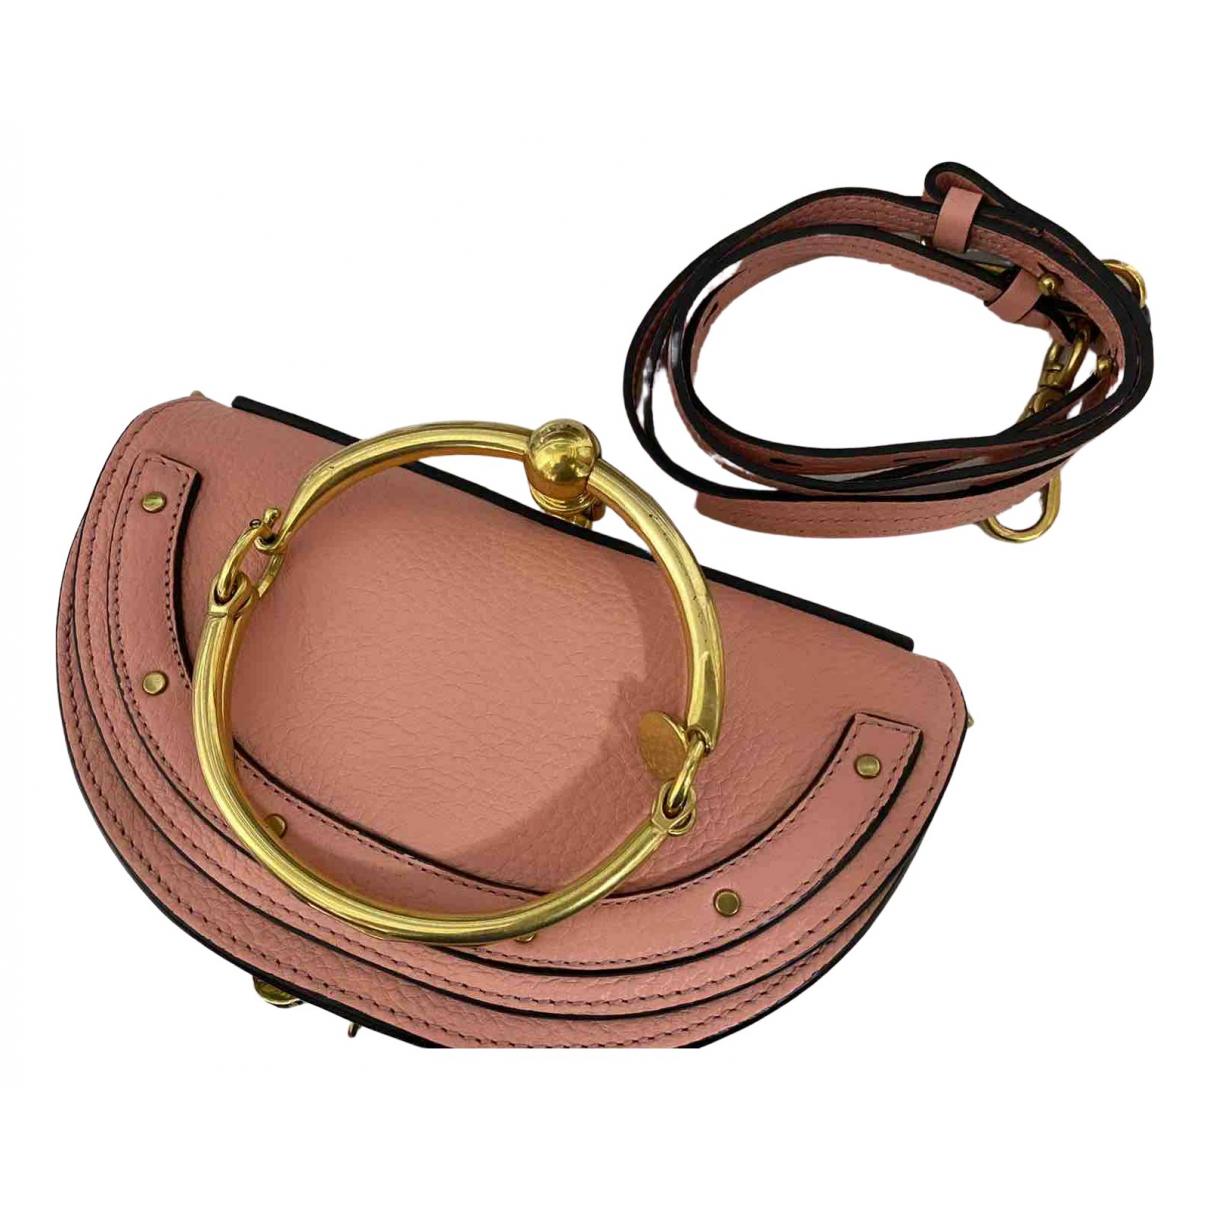 Chloé Bracelet Nile Pink Leather handbag for Women N